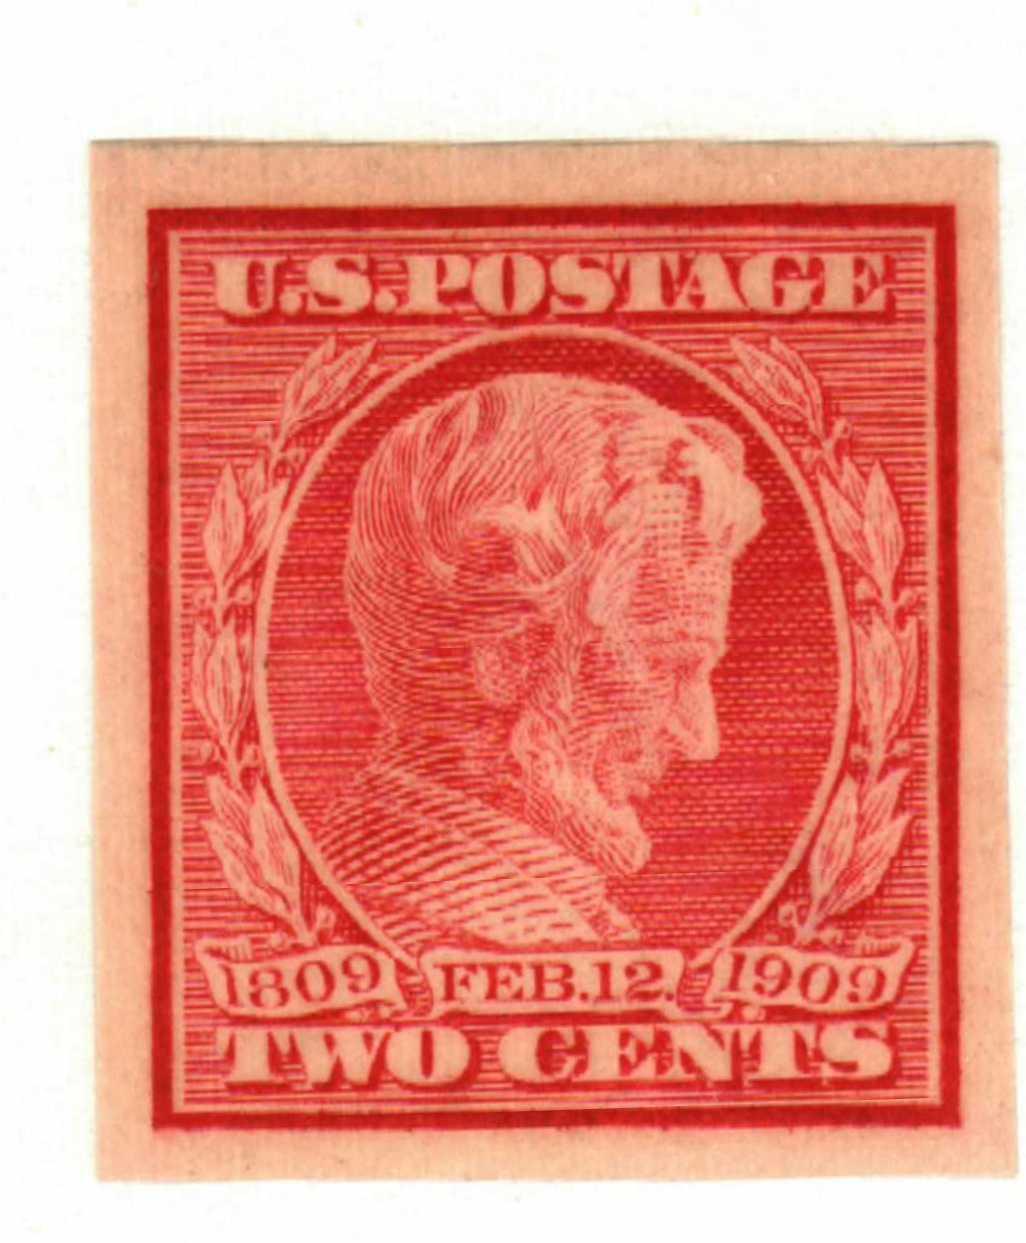 1909 2c Lincoln, carmine, imperforate